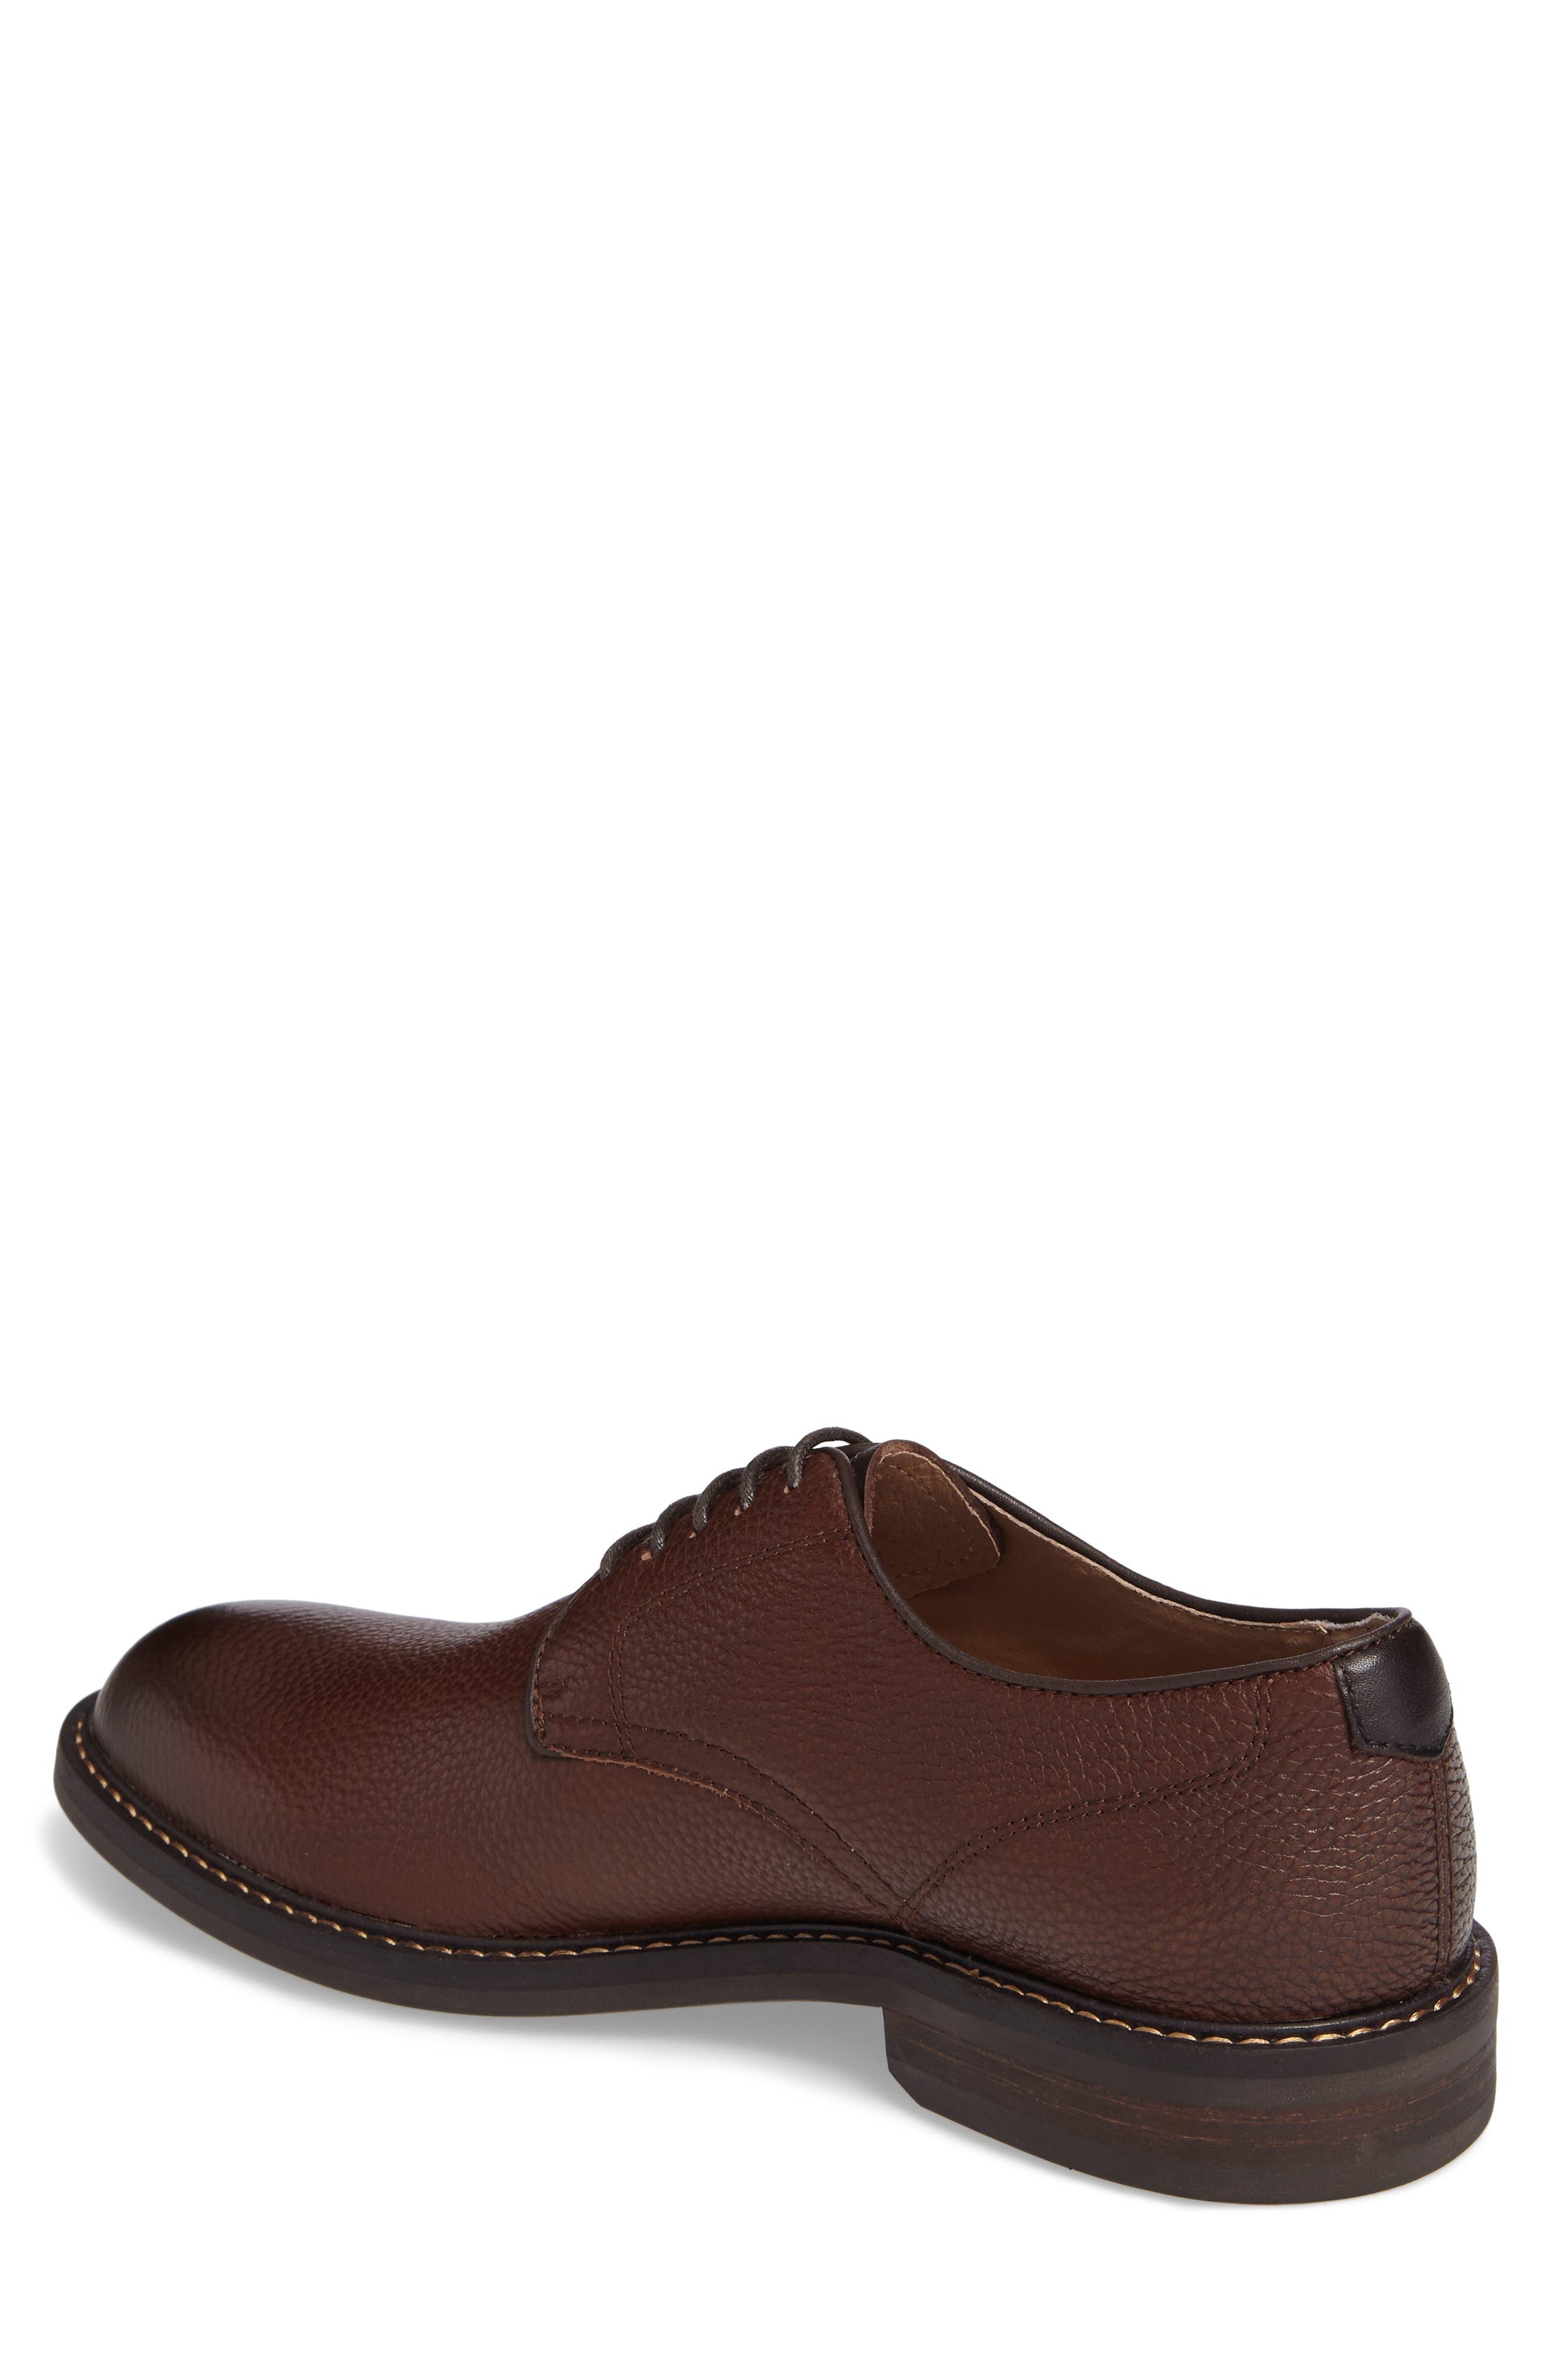 Alternate Image 2  - 1901 Byron Buck Shoe (Men)